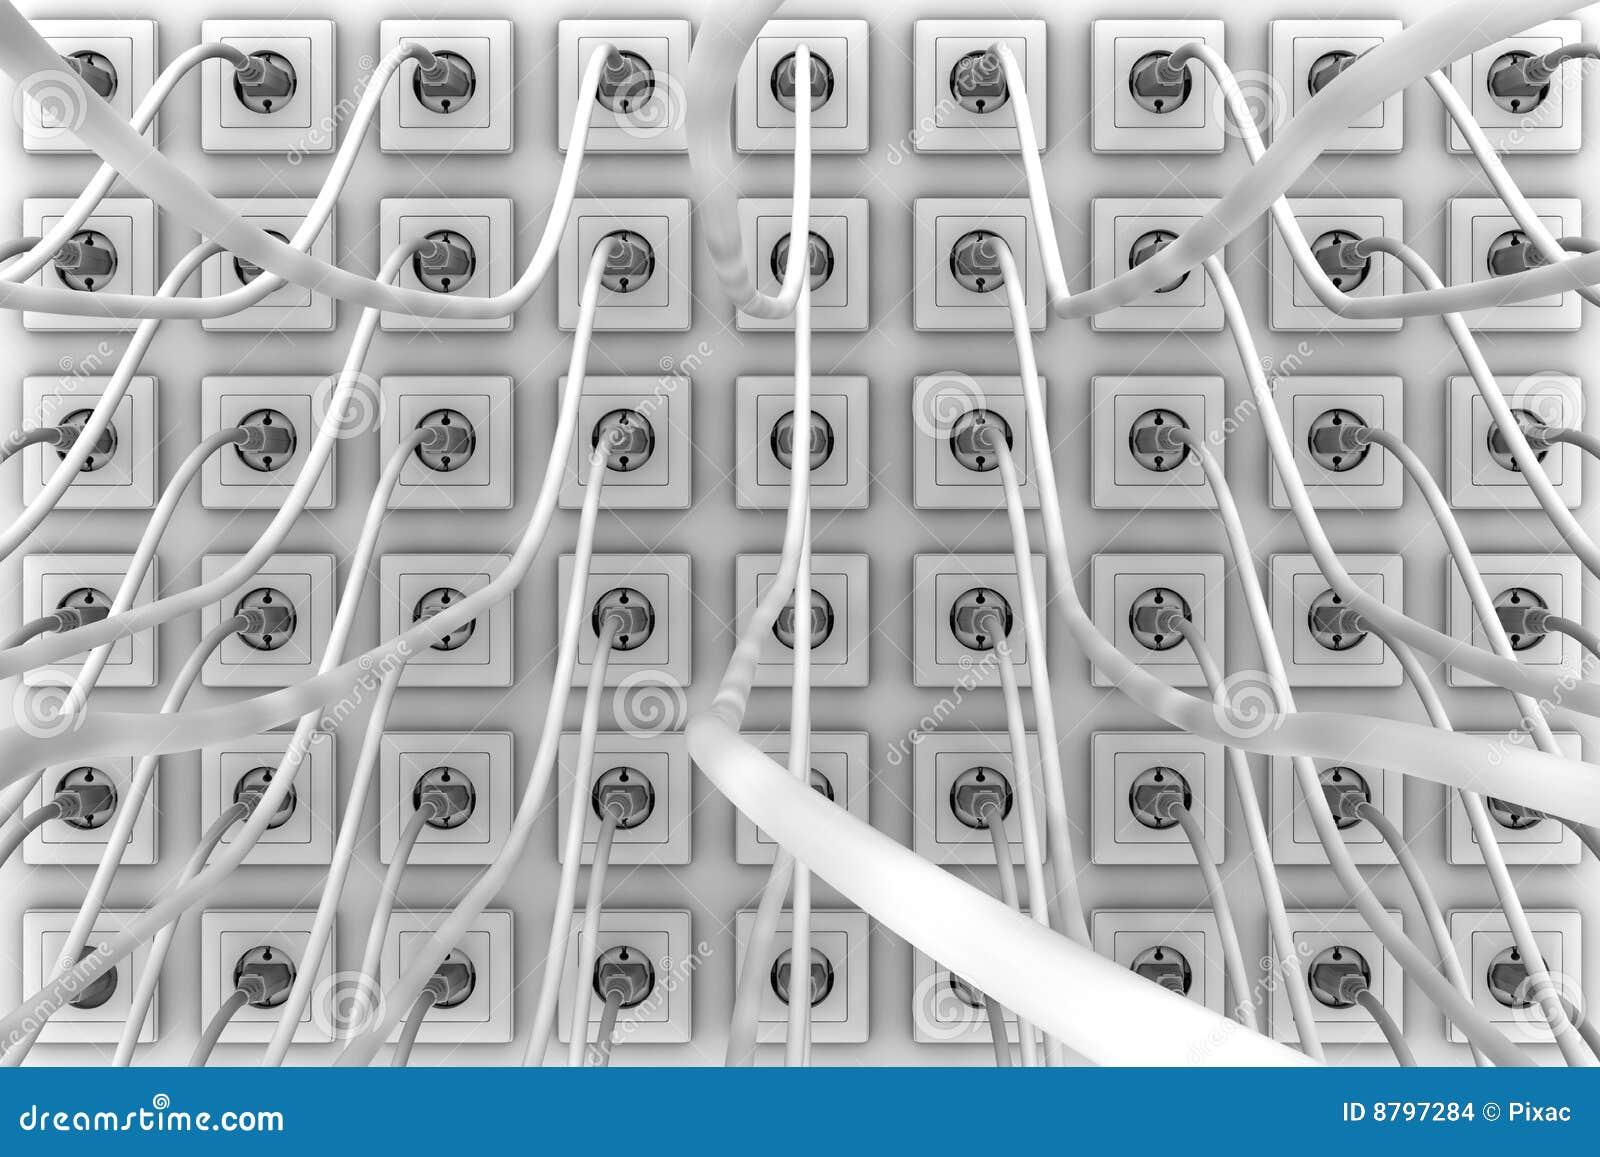 wall of power plugs stock illustration illustration of receptacle